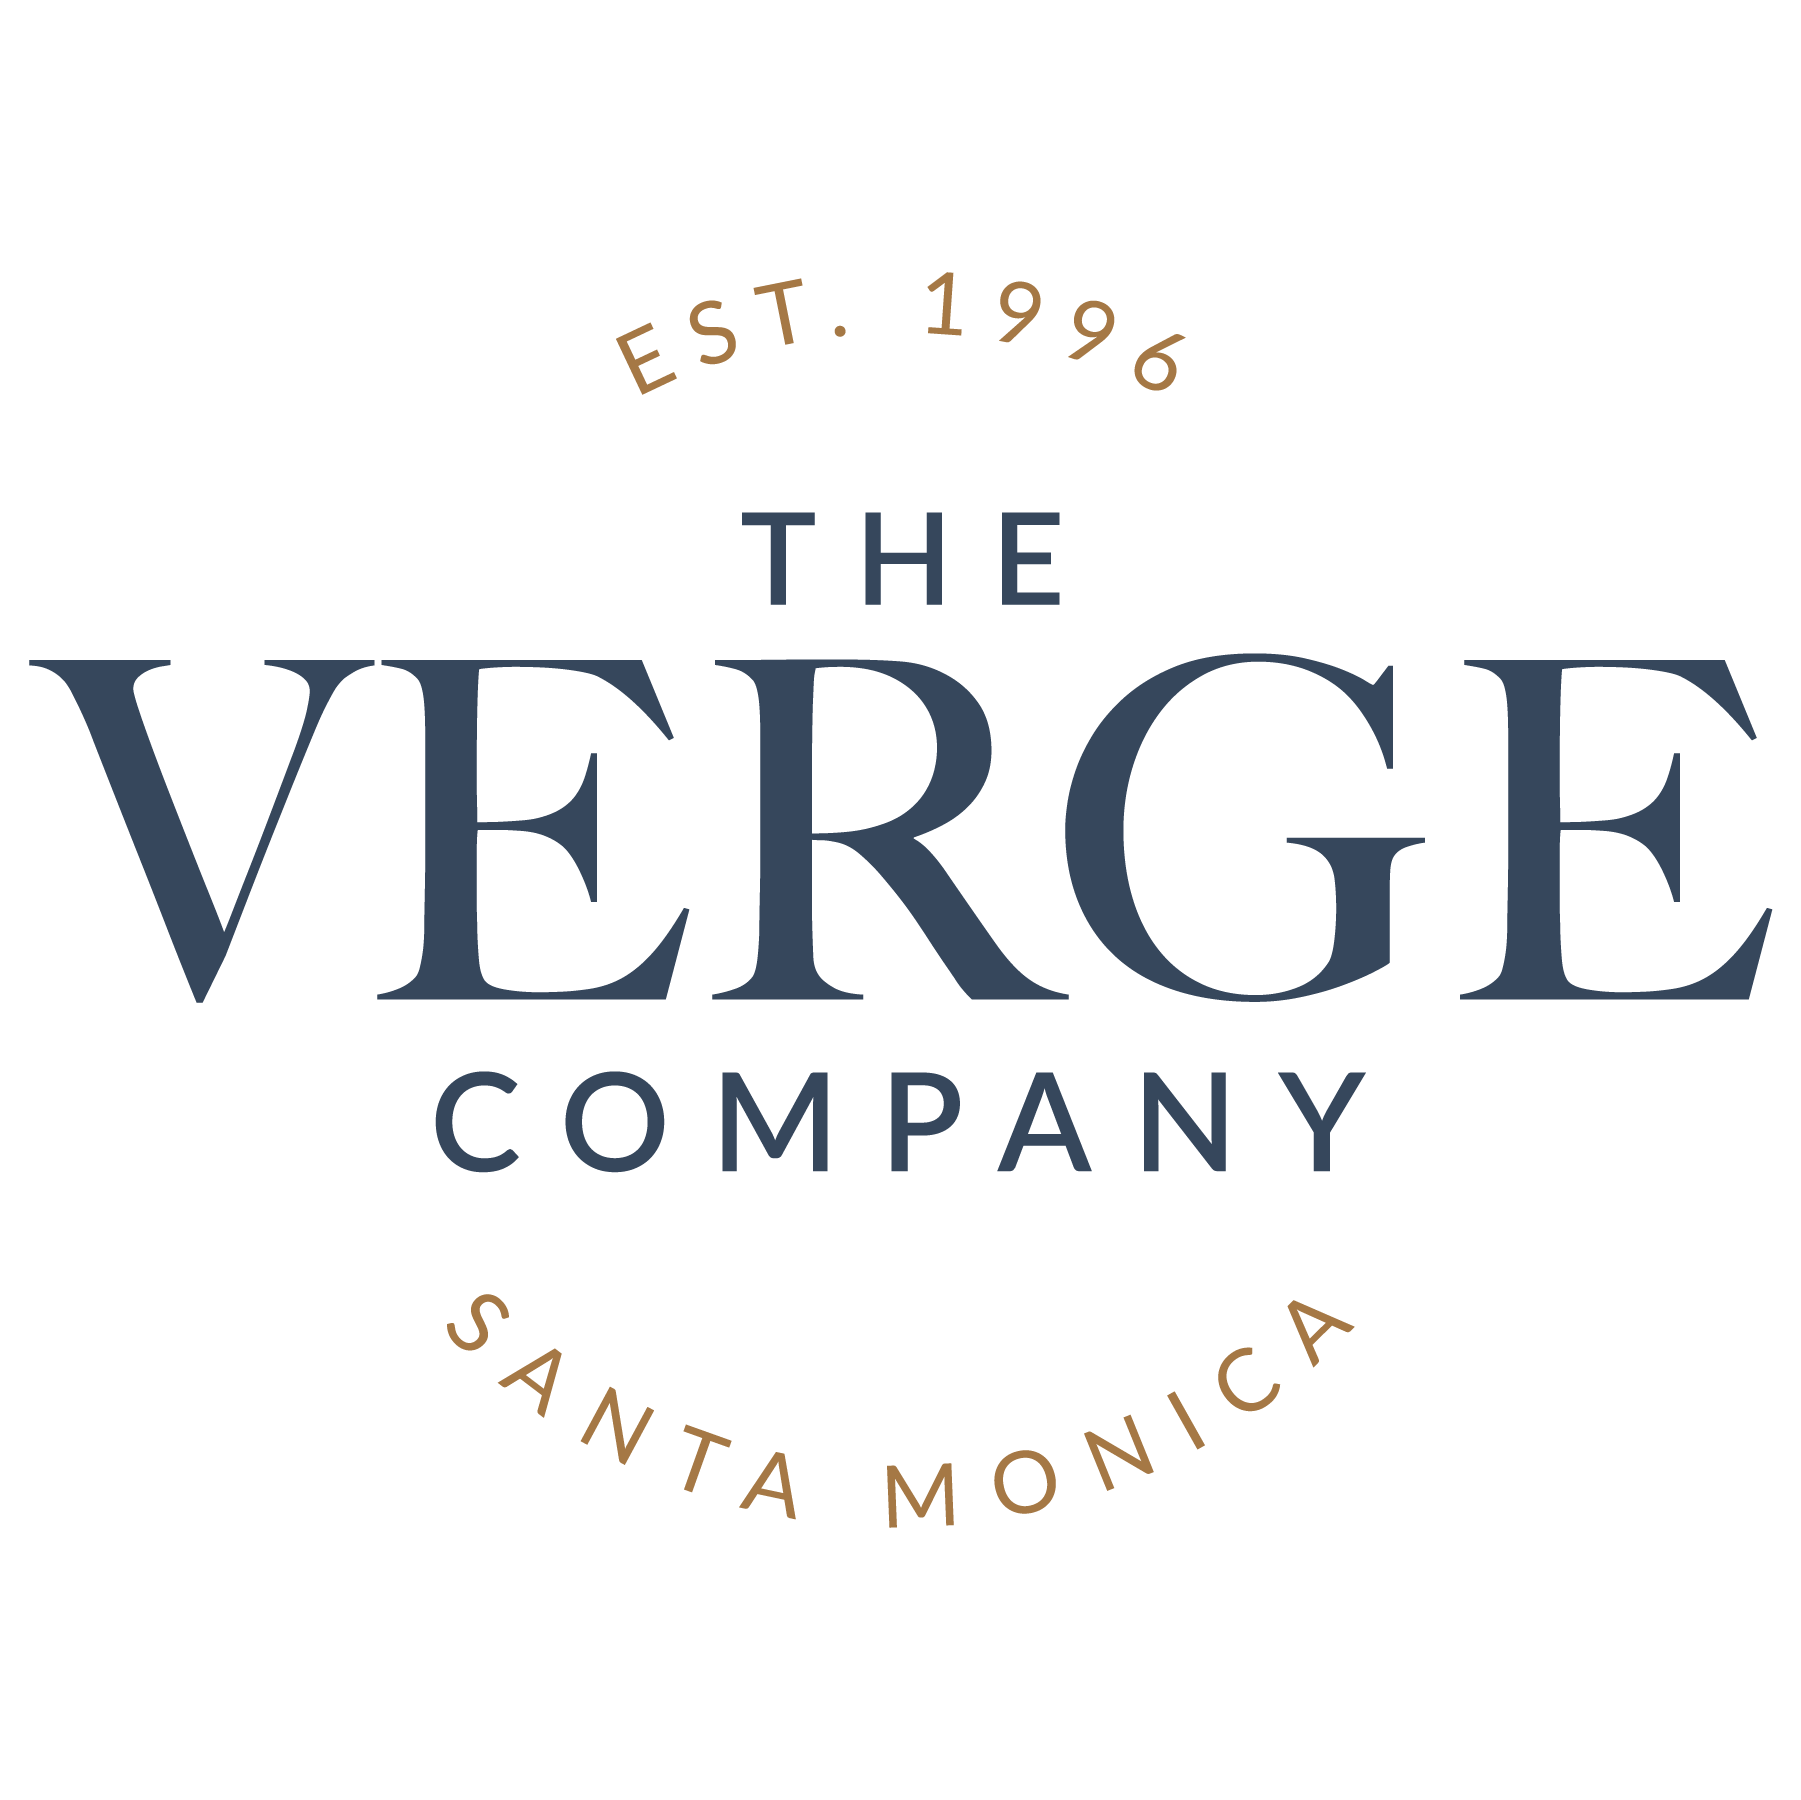 The Verge Company